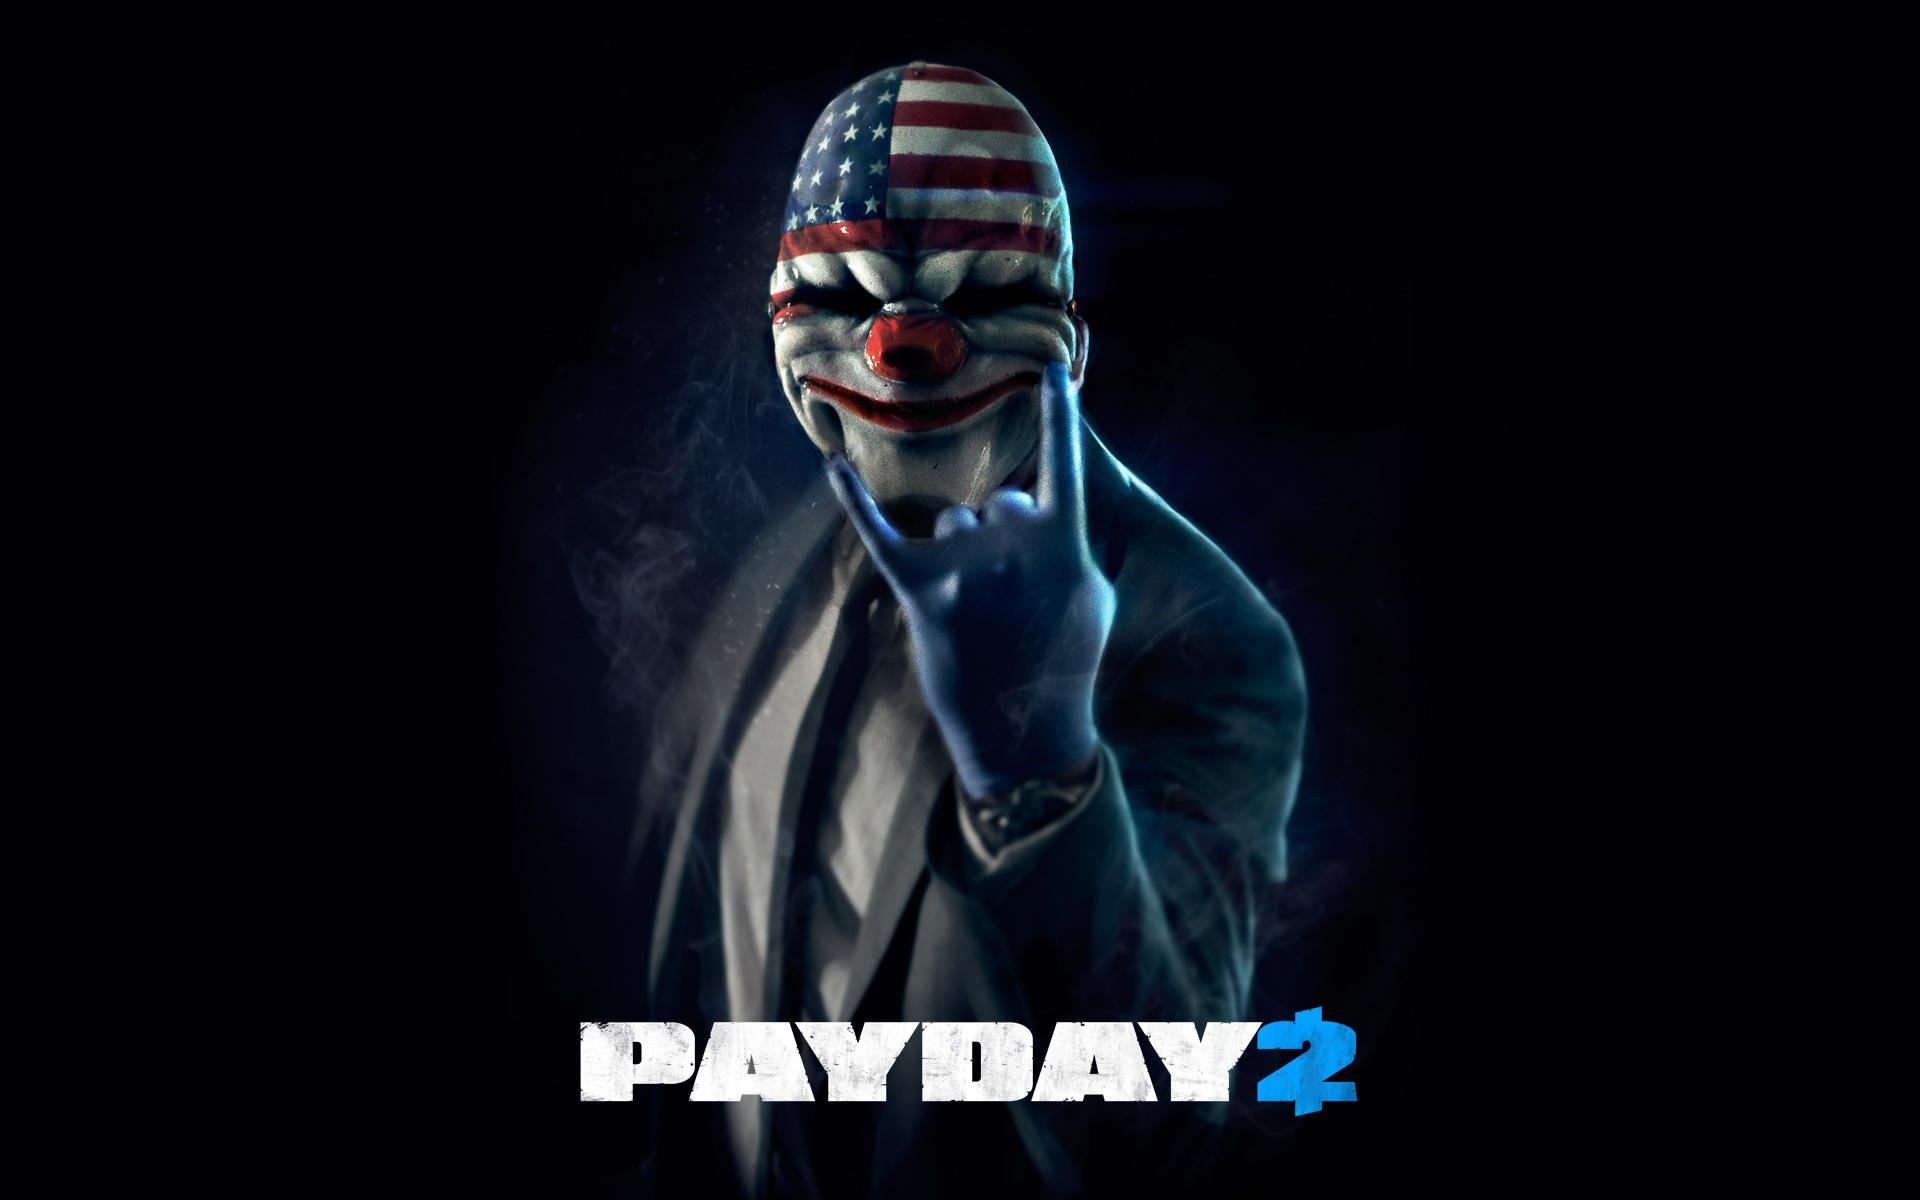 Payday 2 HD Обои   Фон   1920x1200   ID:419790 - Wallpaper ...